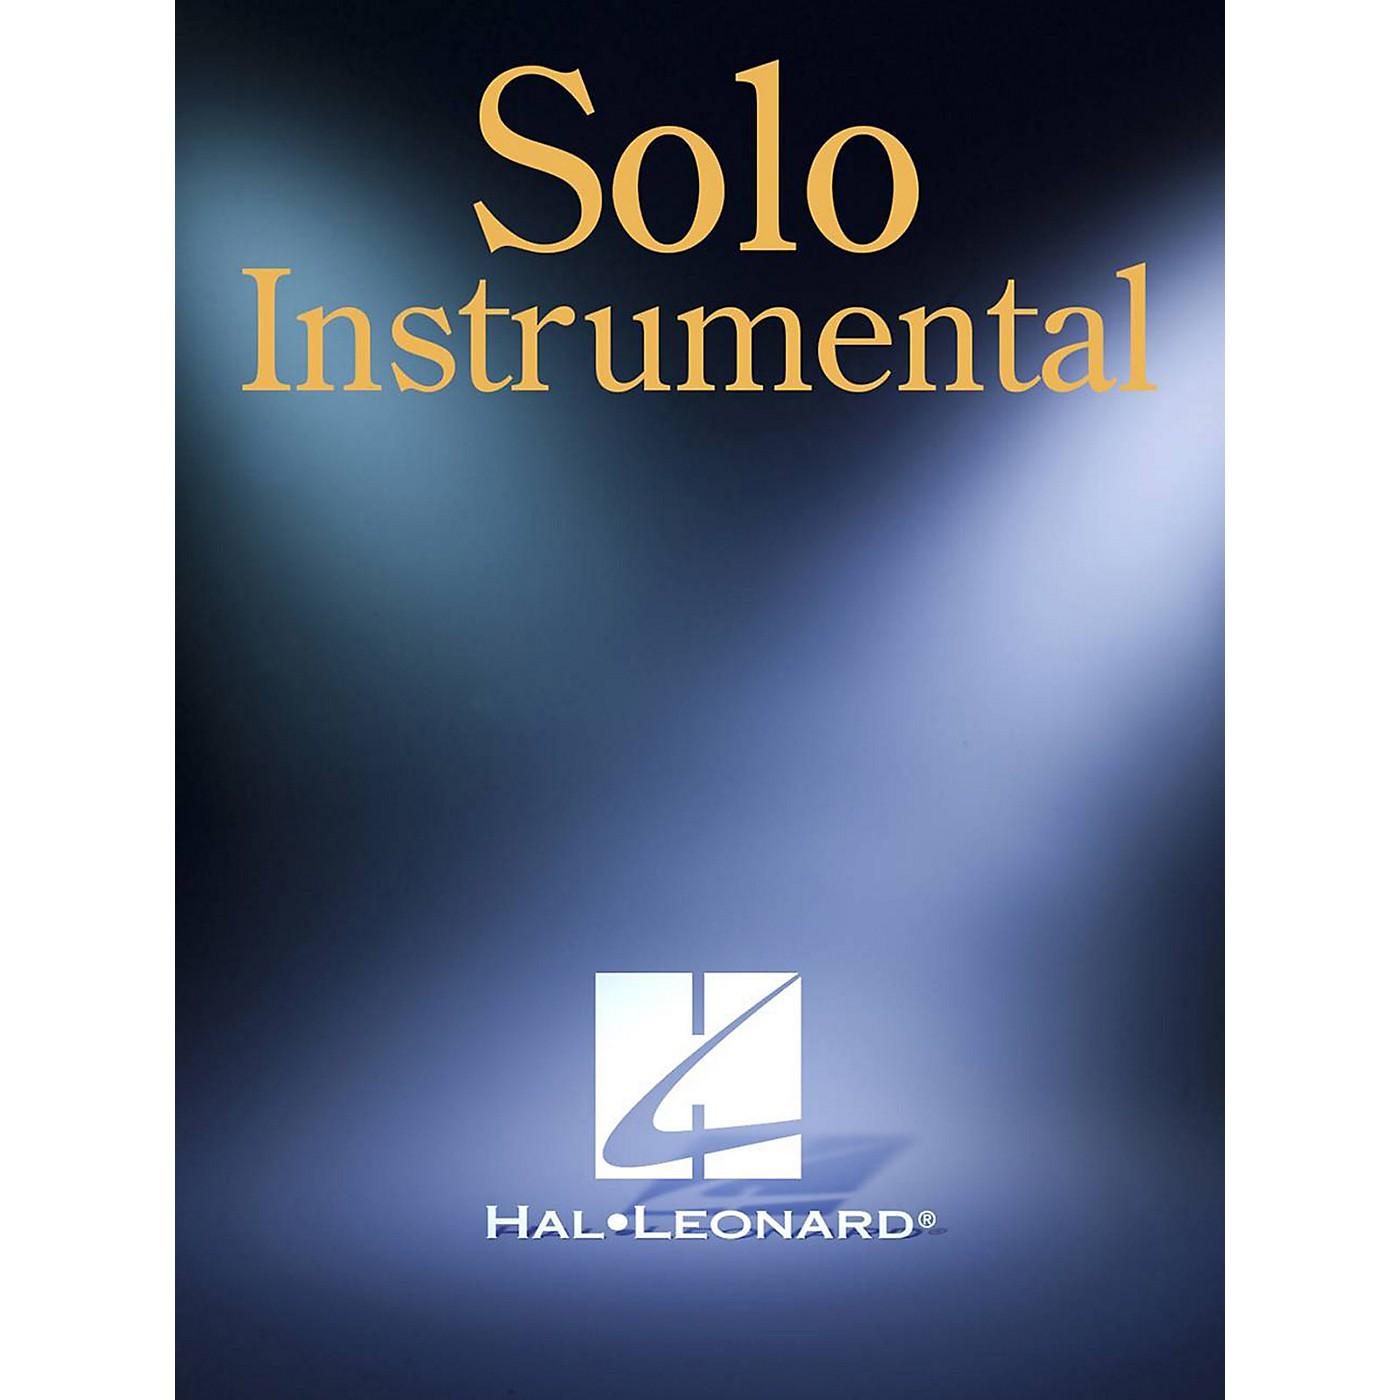 Hal Leonard Joe Henderson - Selections from Lush Life and So Near, So Far Artist Transcriptions by Joe Henderson thumbnail